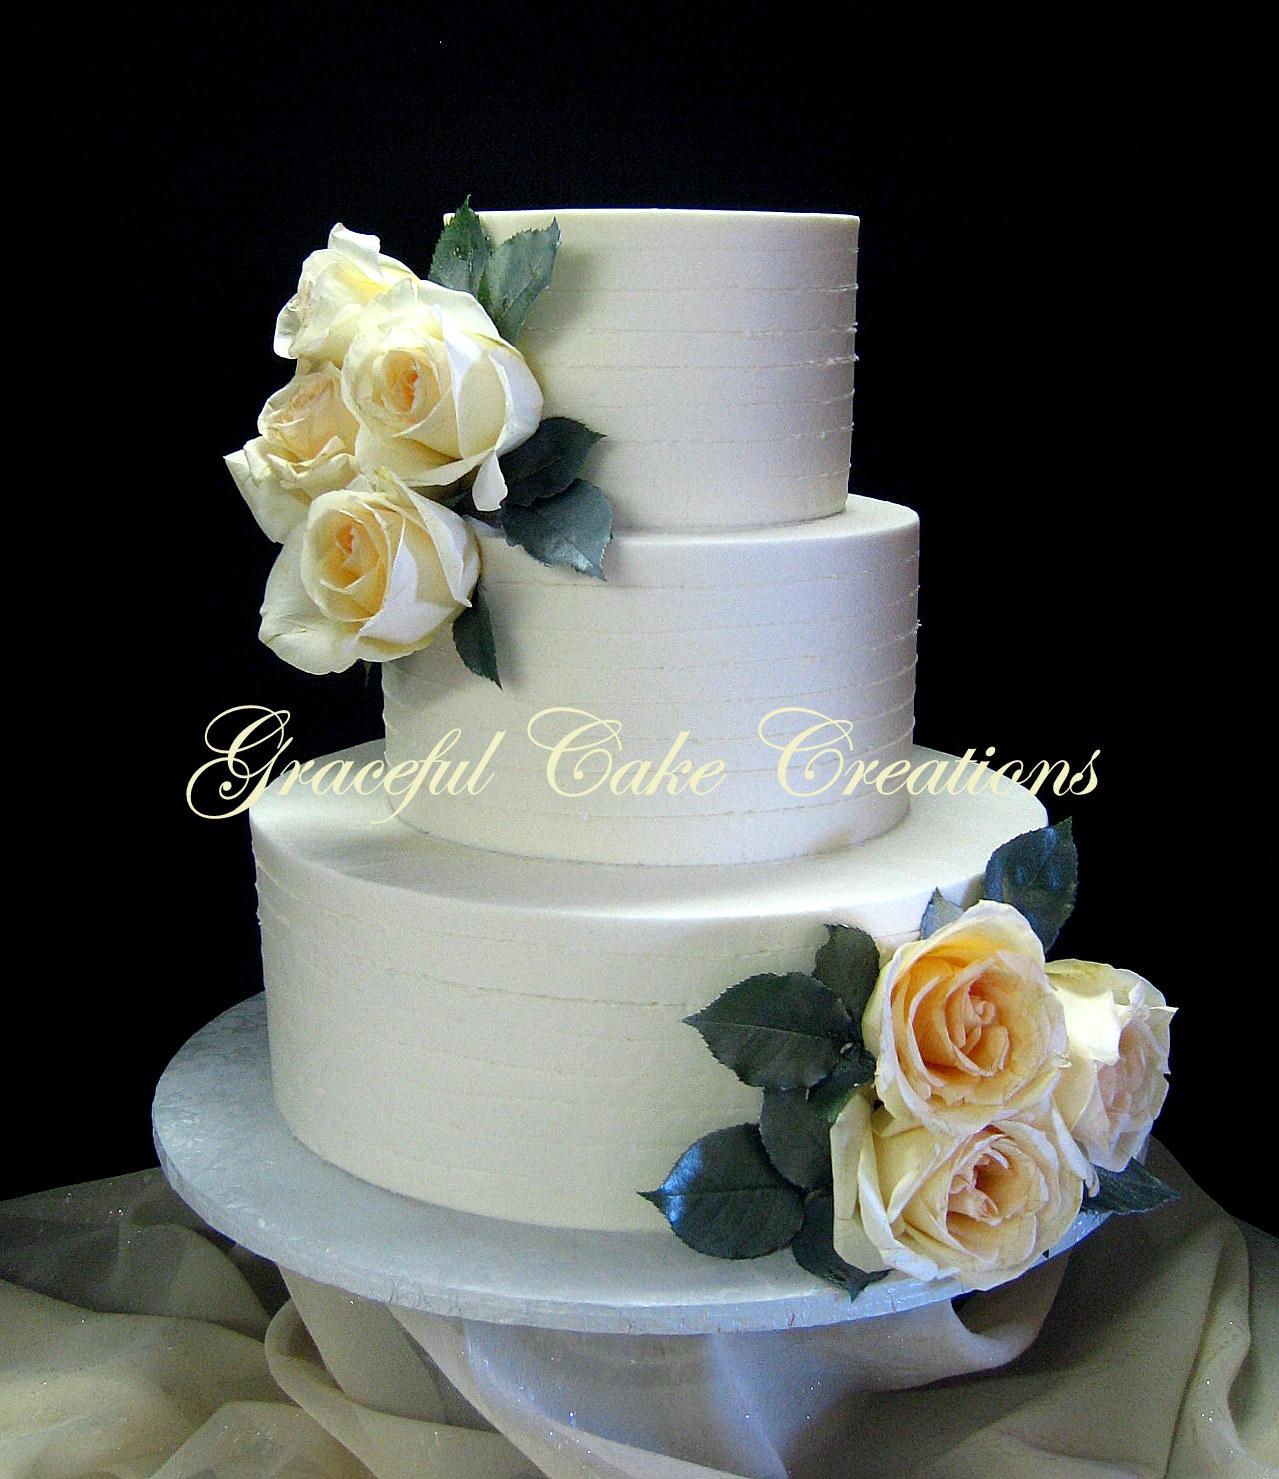 Elegant Ivory Butter Cream Wedding Cake with Vintage Roses